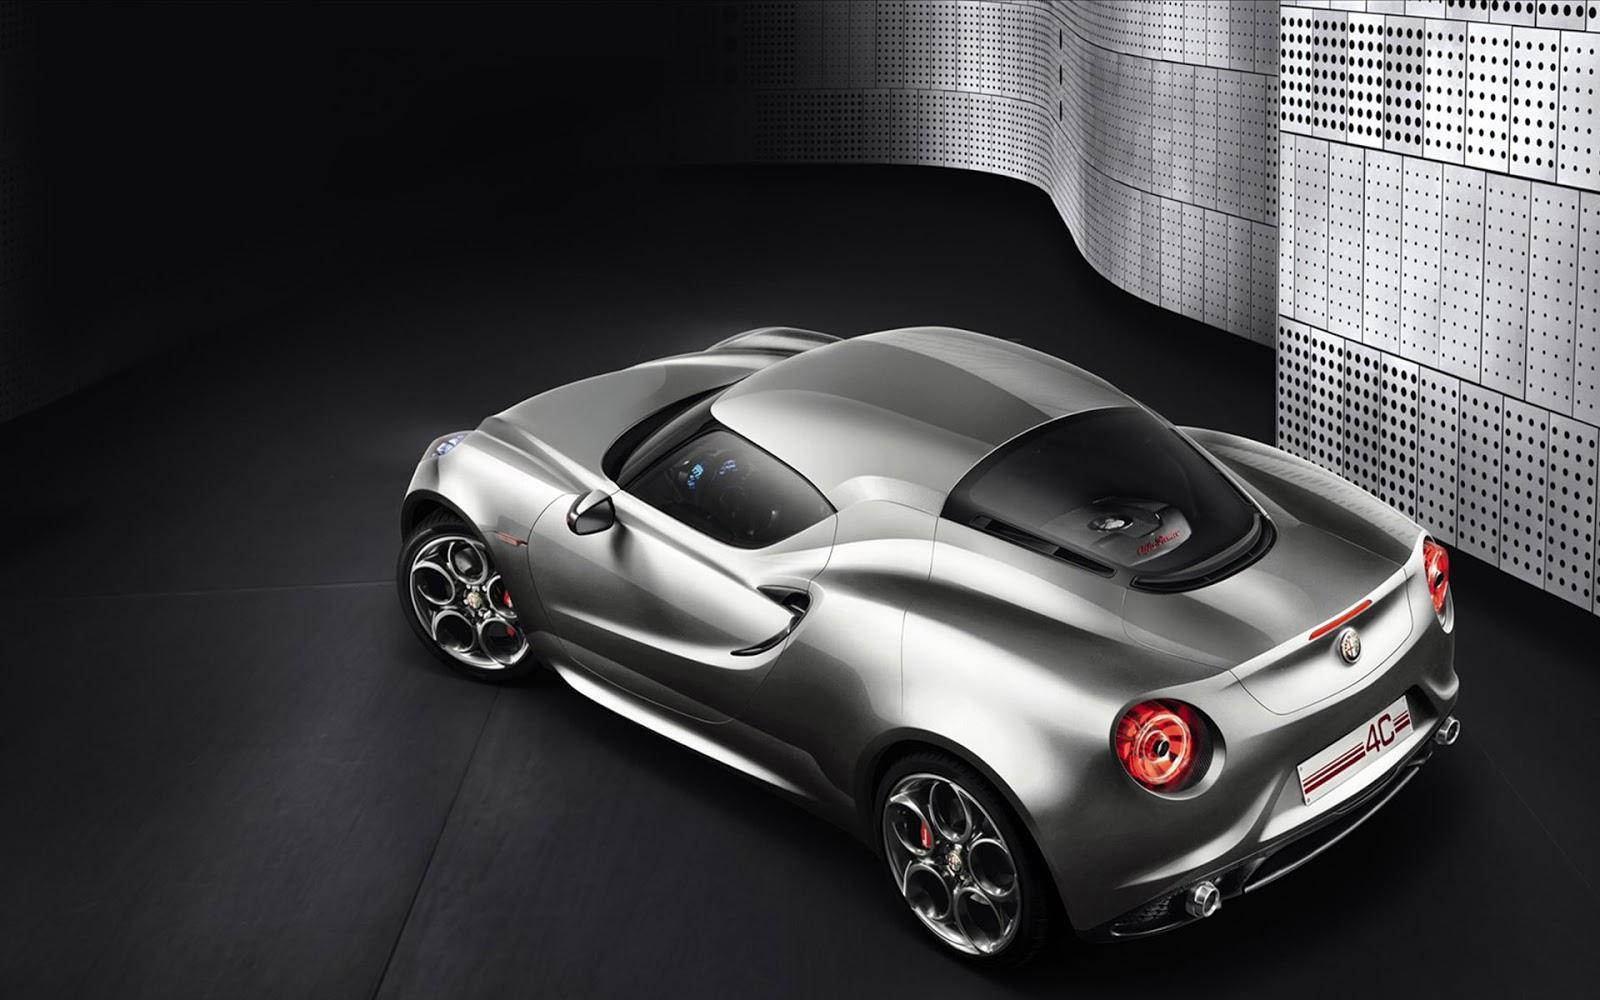 http://2.bp.blogspot.com/-sv6ZDwA6gnA/UQHyPZSryAI/AAAAAAAAAEg/uJ6iwu3FhwU/s1600/2013-Alfa-Romeo-4C-Concept-2-cars-model-wallpapers-1.jpg